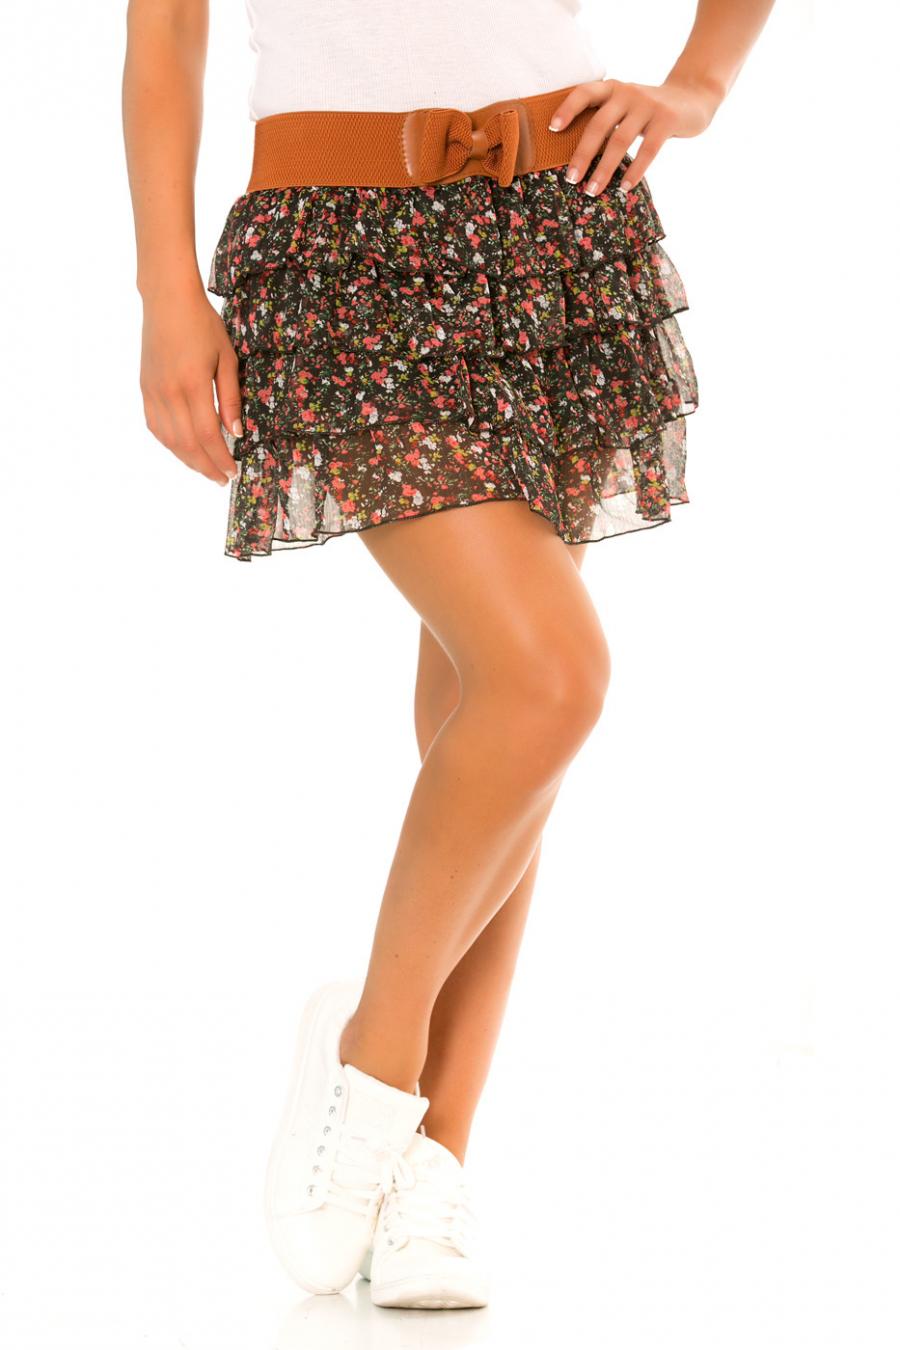 Black sheer mini skirt with red flowers pattern elastic waistband - 920